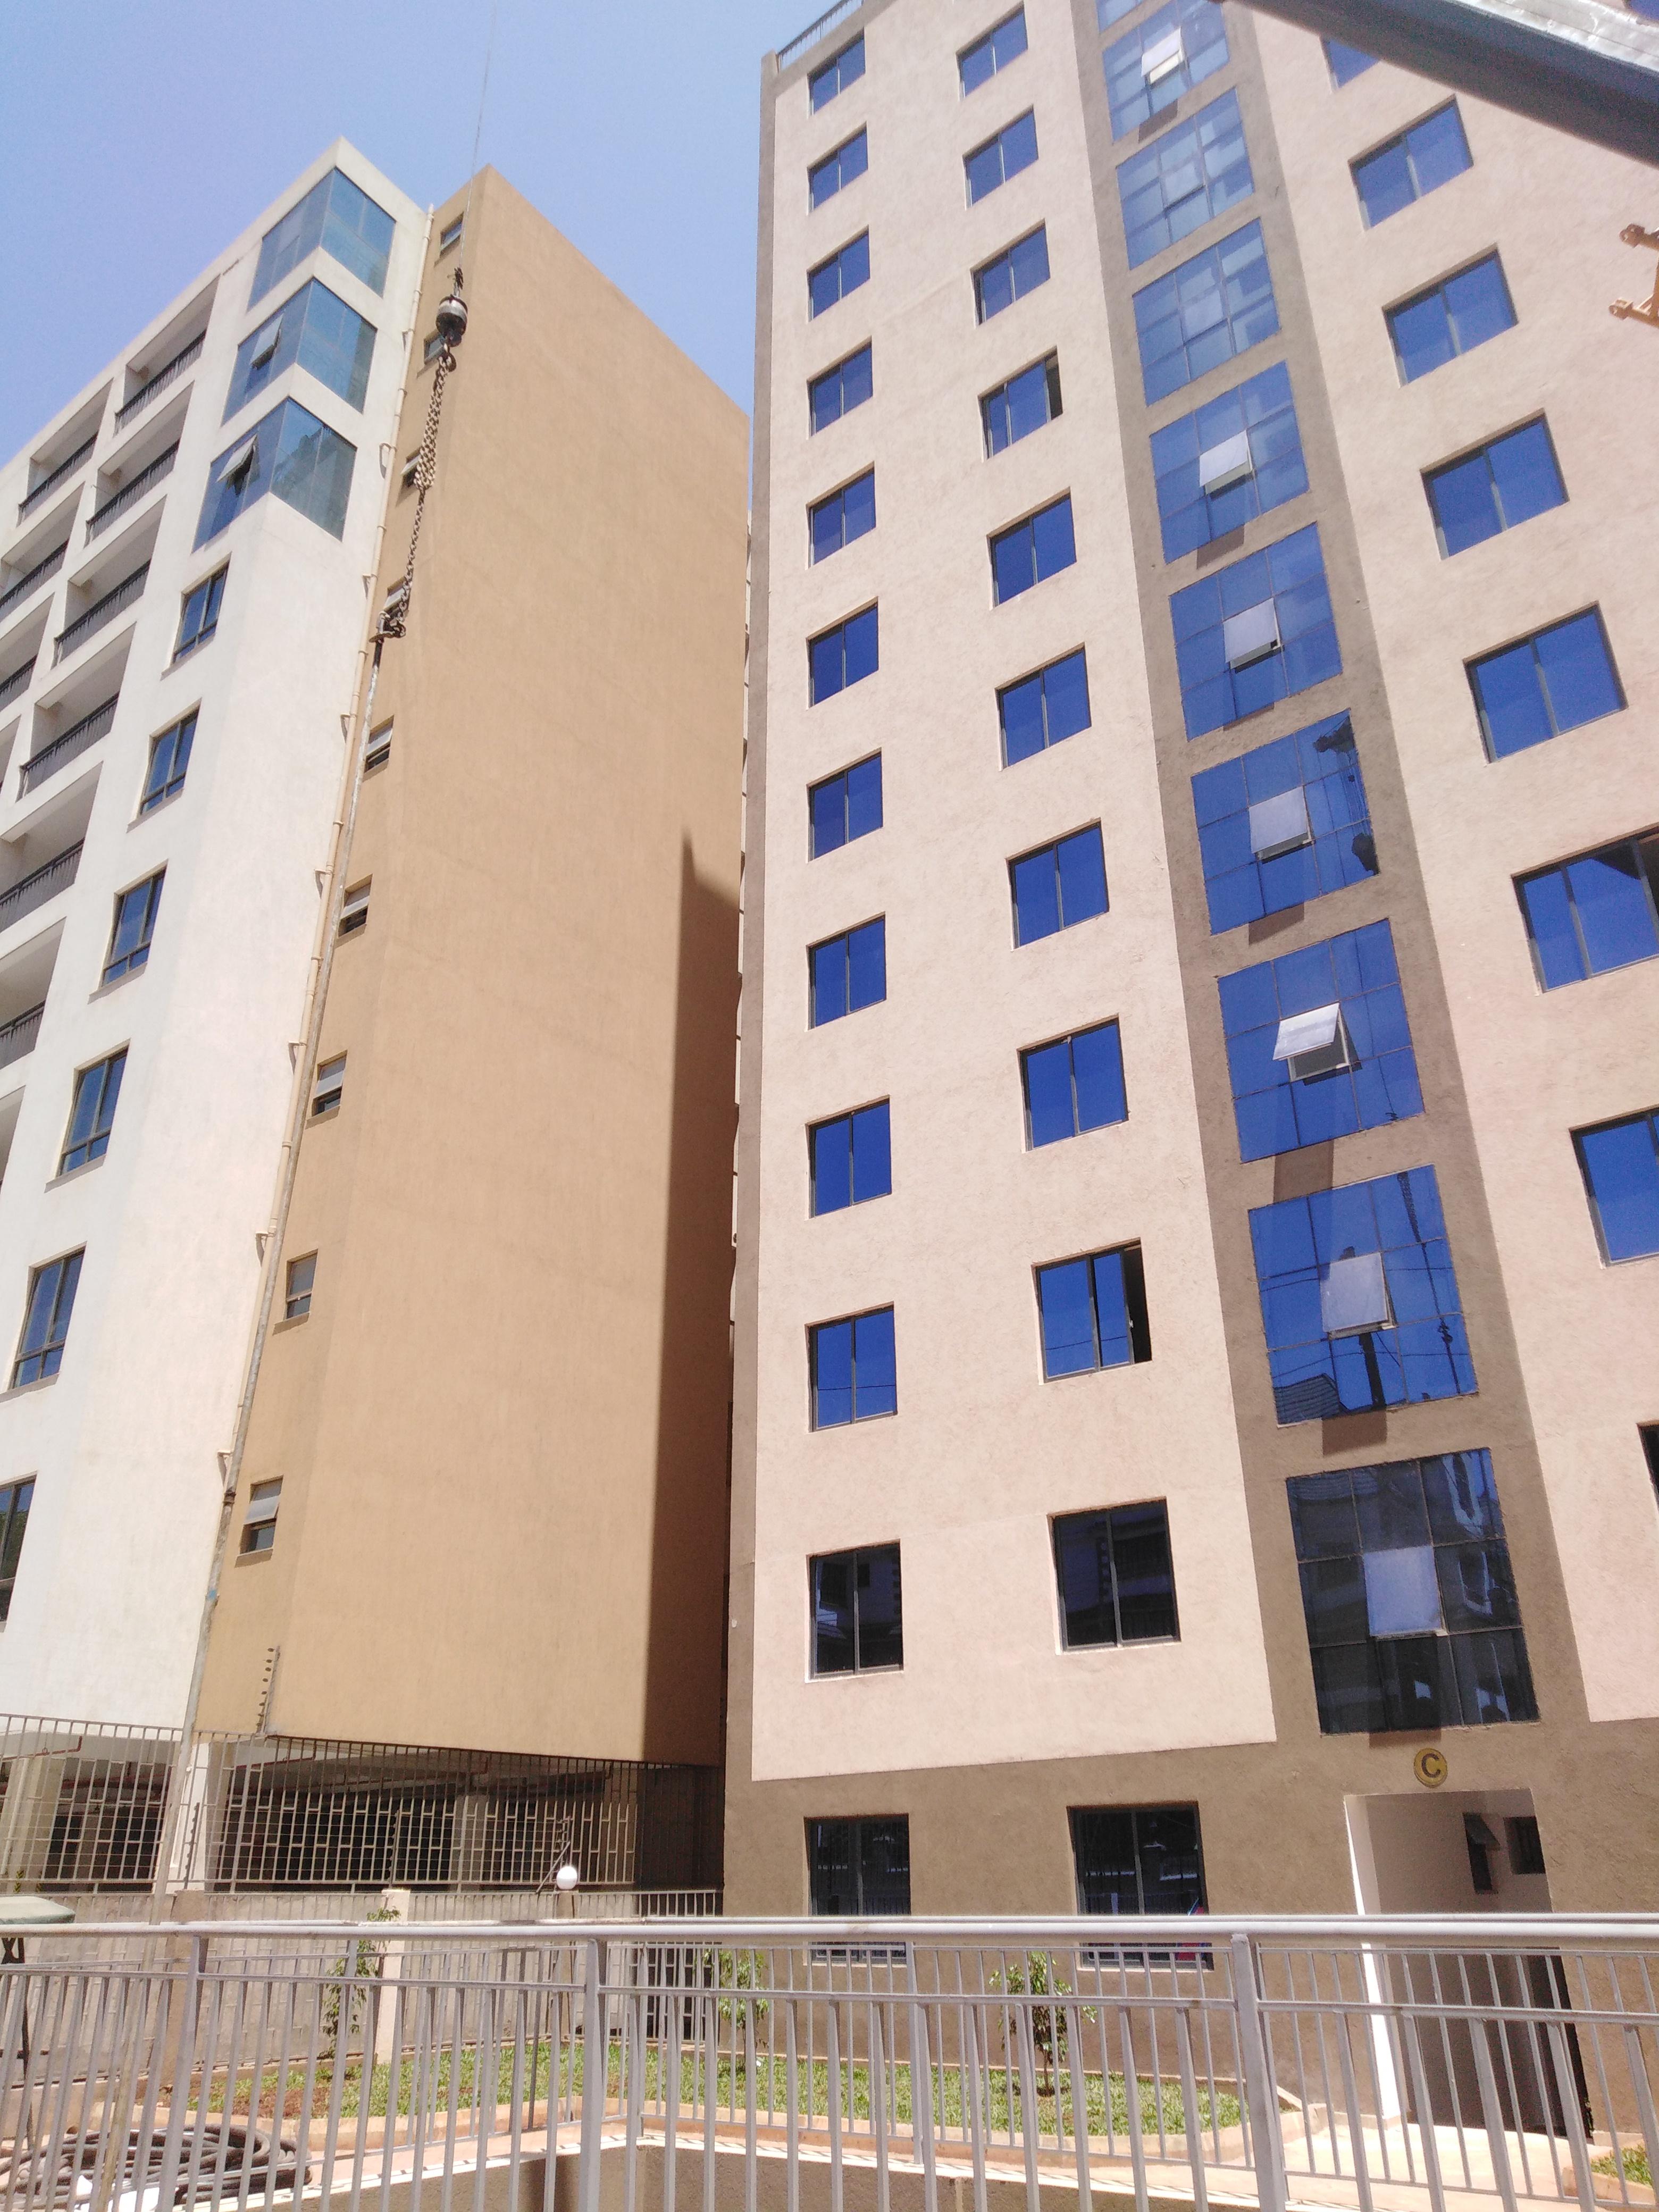 2 & 3 bedroom apartments to let in Kileleshwa